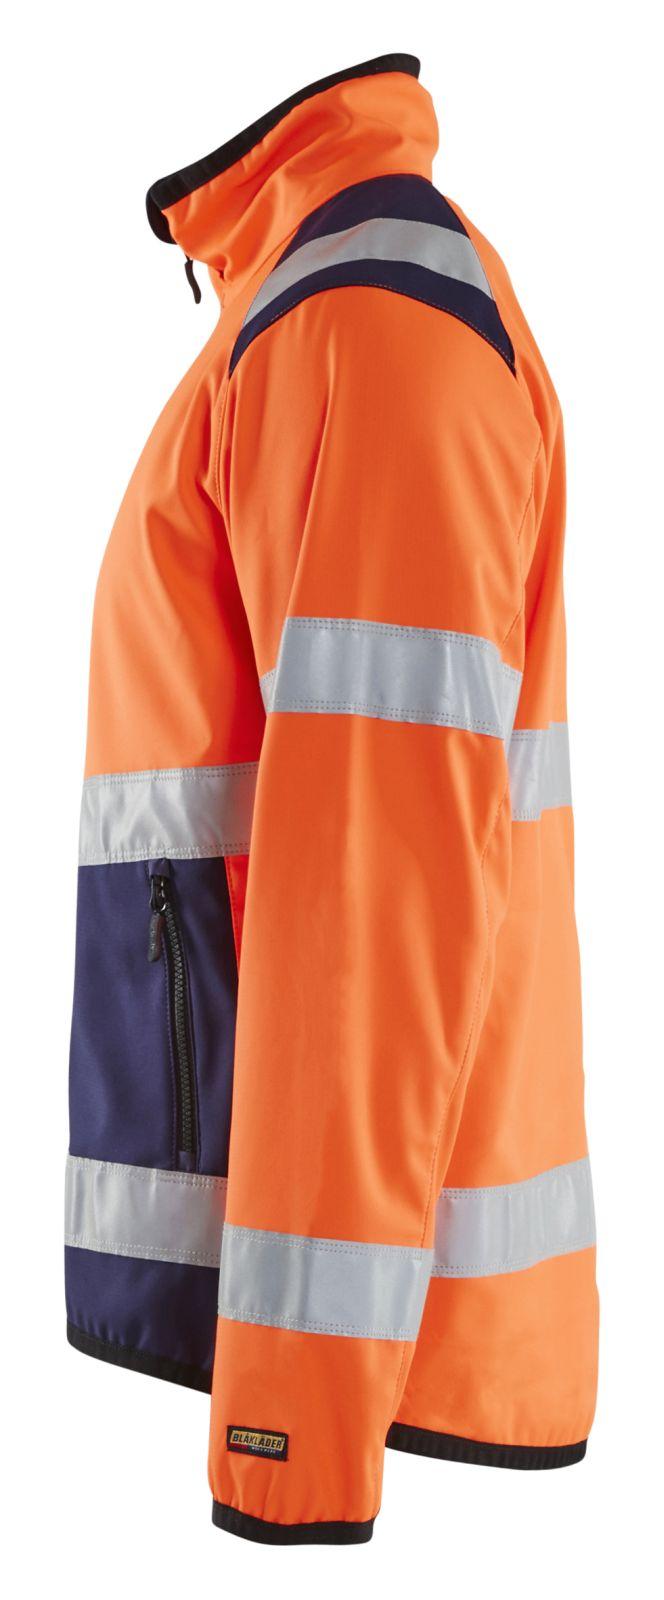 Blaklader Softshell jacks 48772516 High Vis oranje-marineblauw(5389)